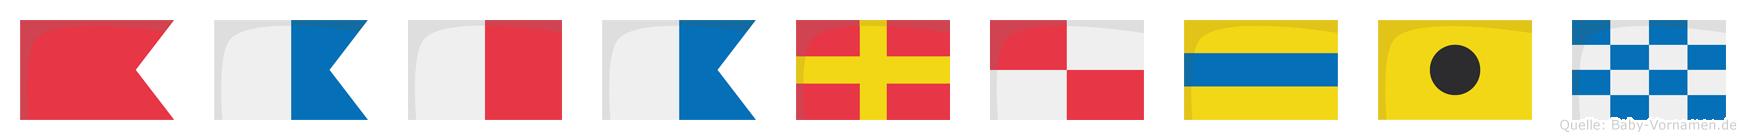 Baharudin im Flaggenalphabet